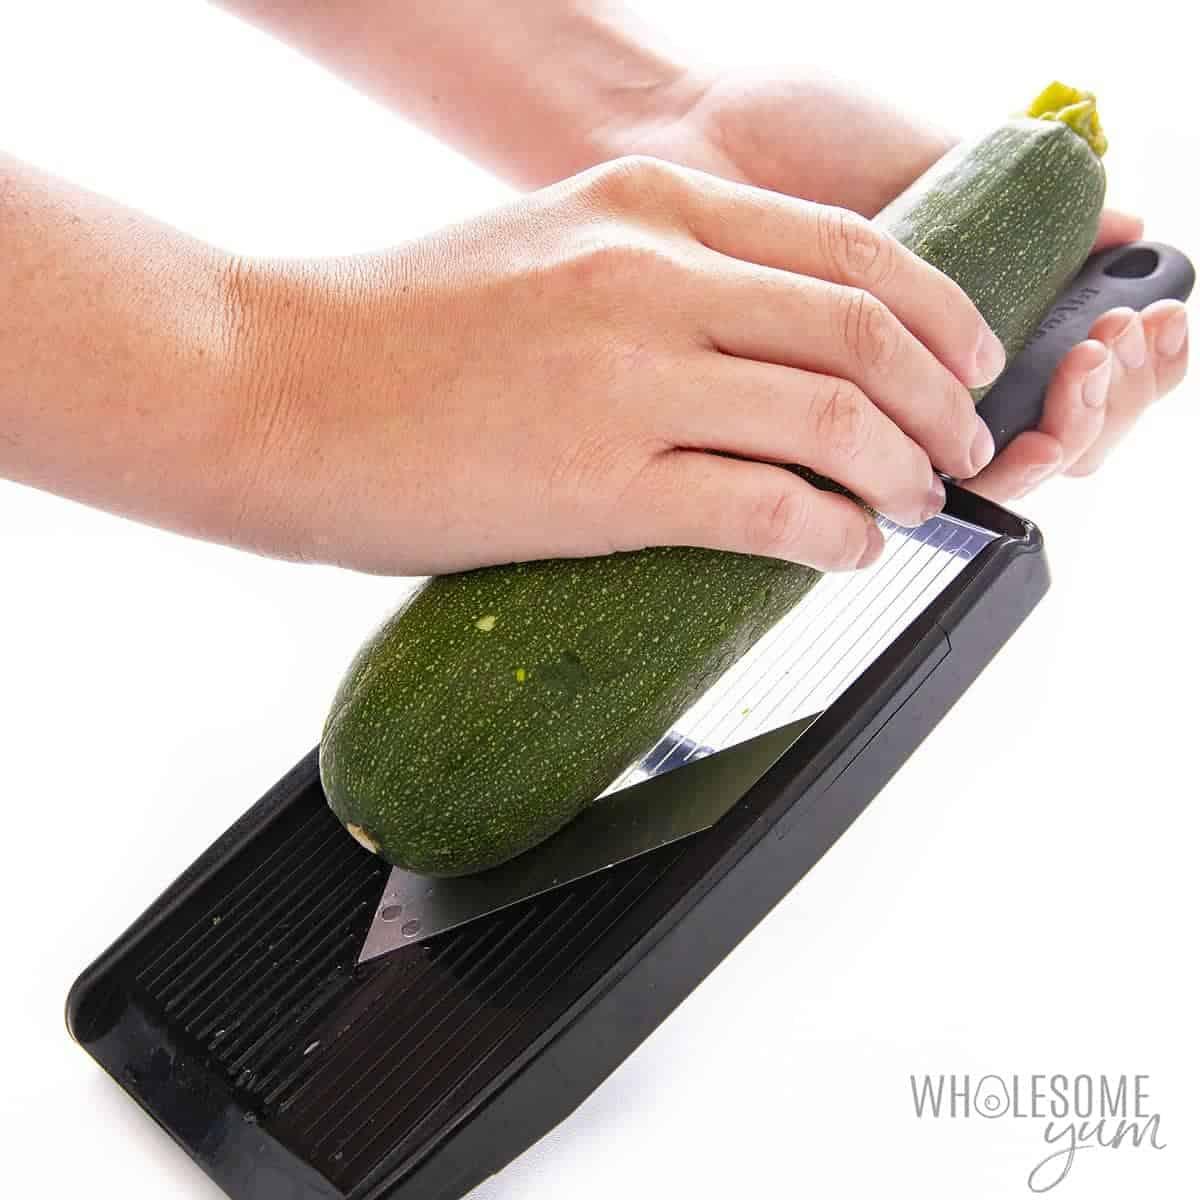 Slicing zucchini with mandoline